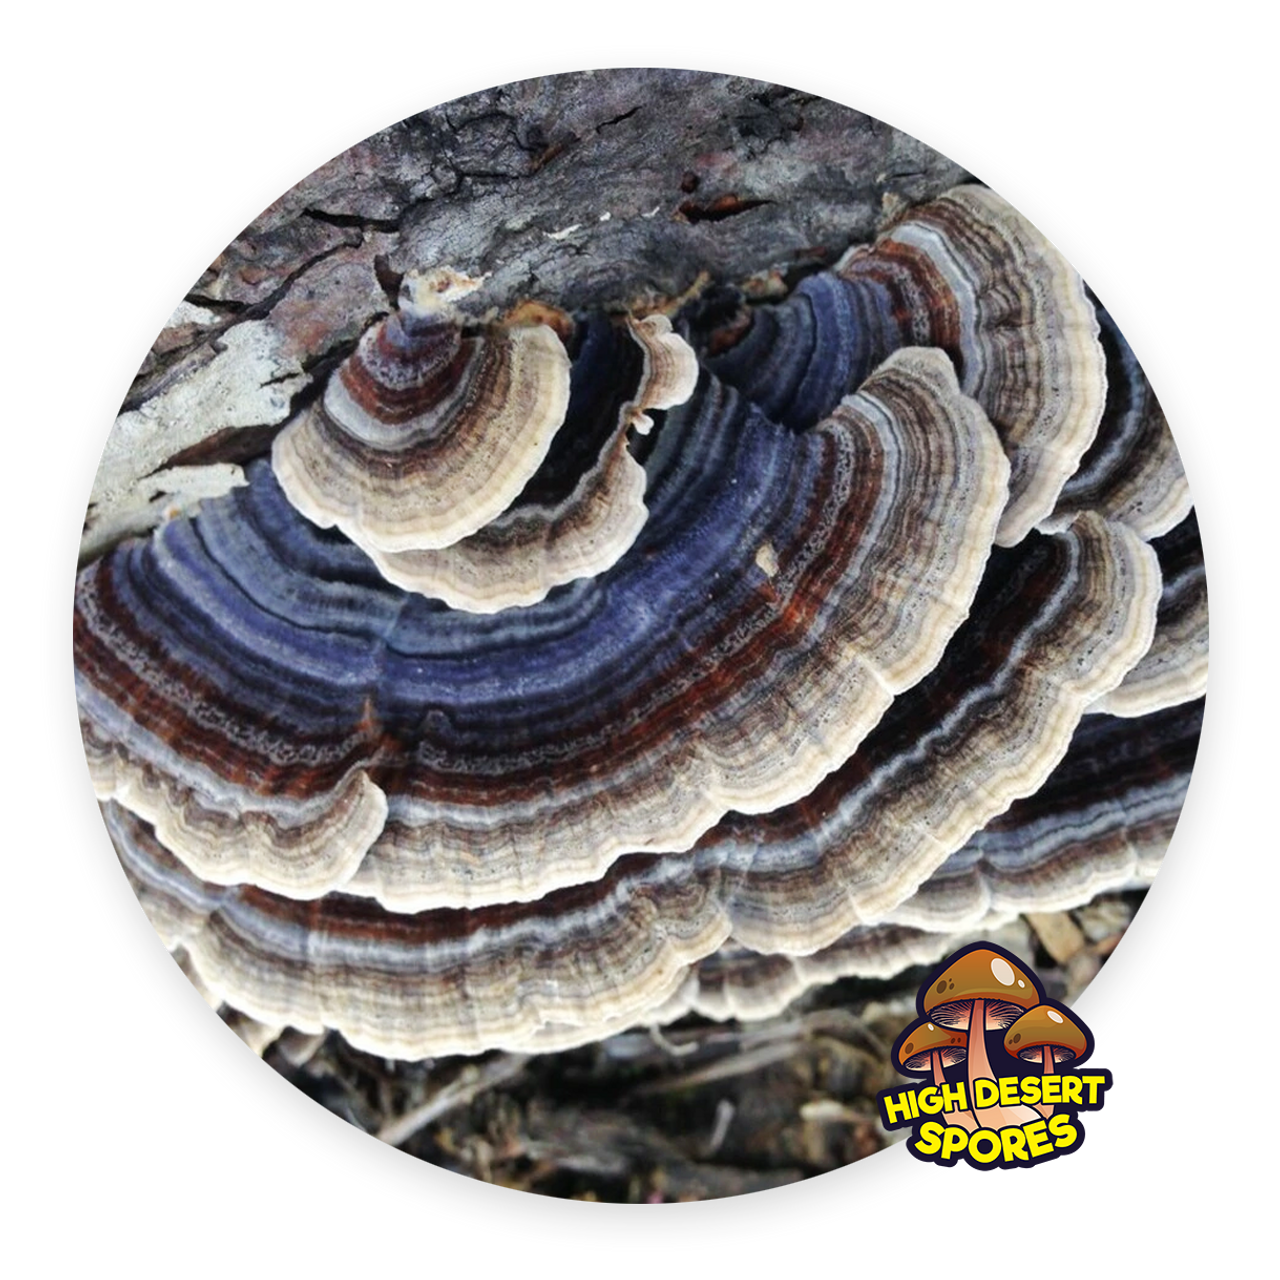 10cc Liquid Mushroom Culture Turkey Tail (Trametes versicolor)